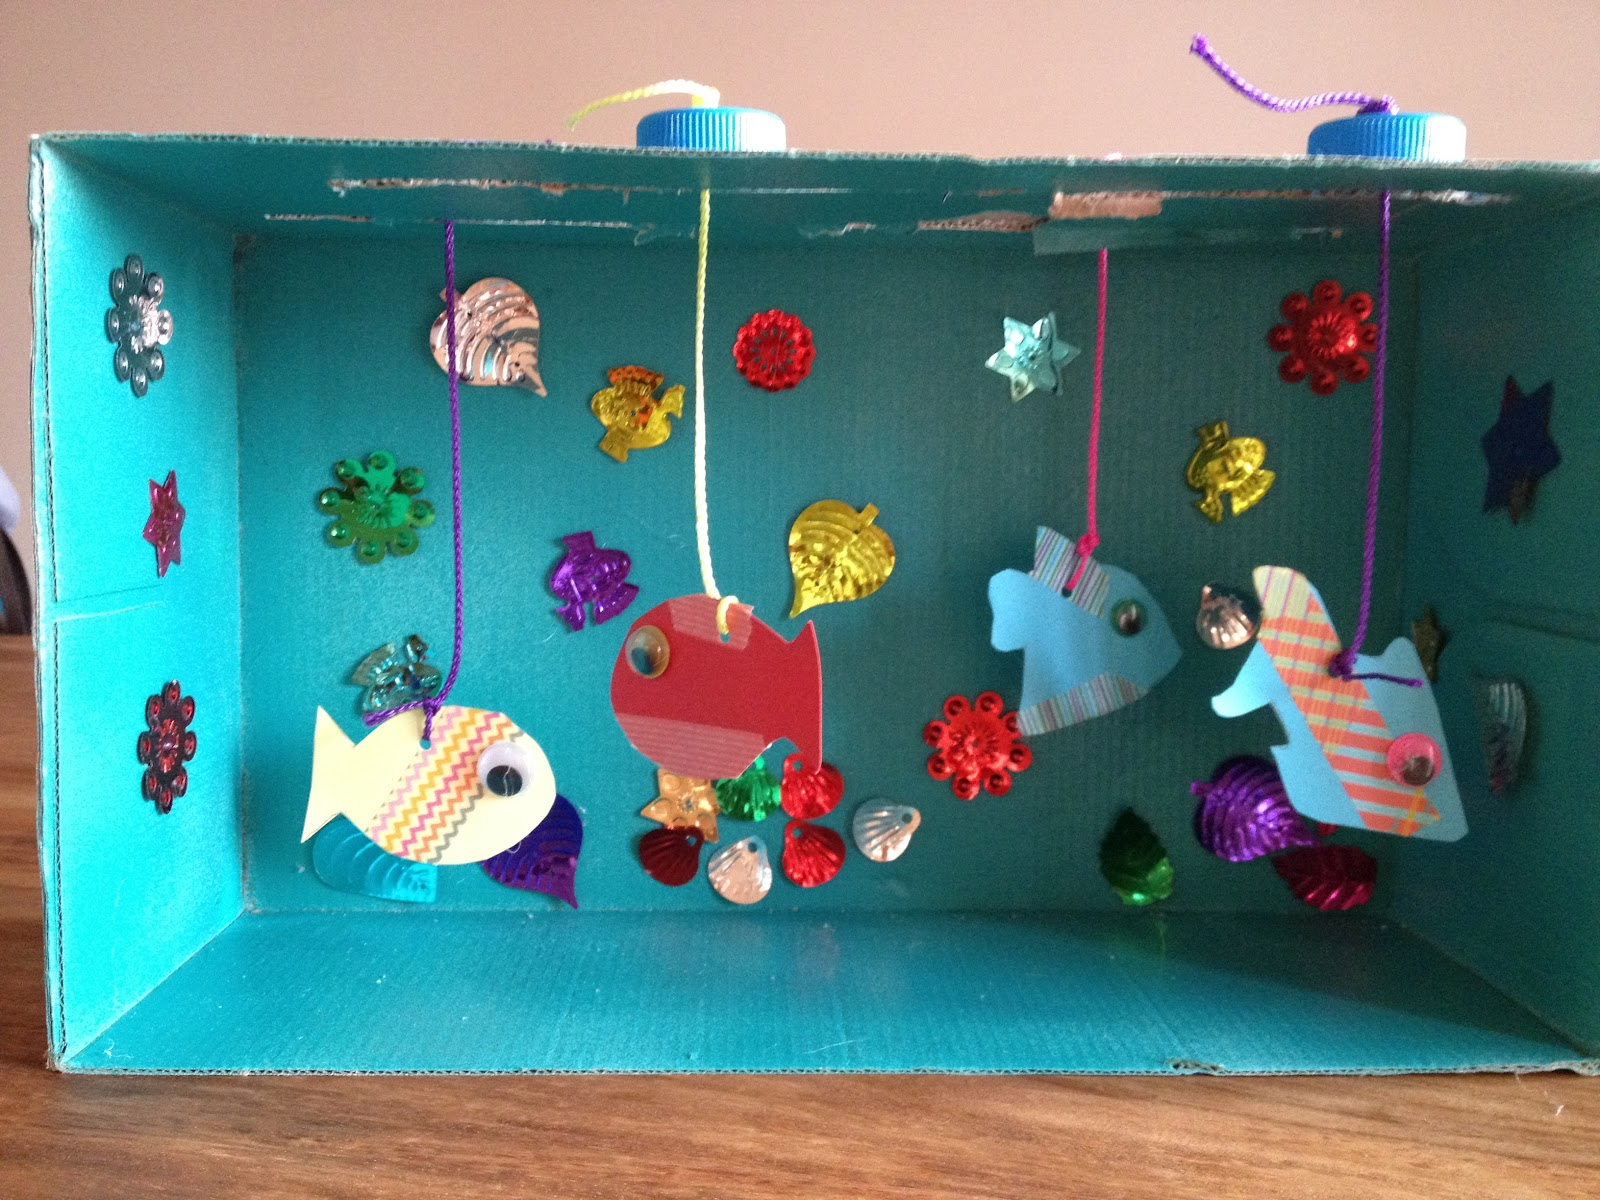 how to make aquarium at home with shoe box